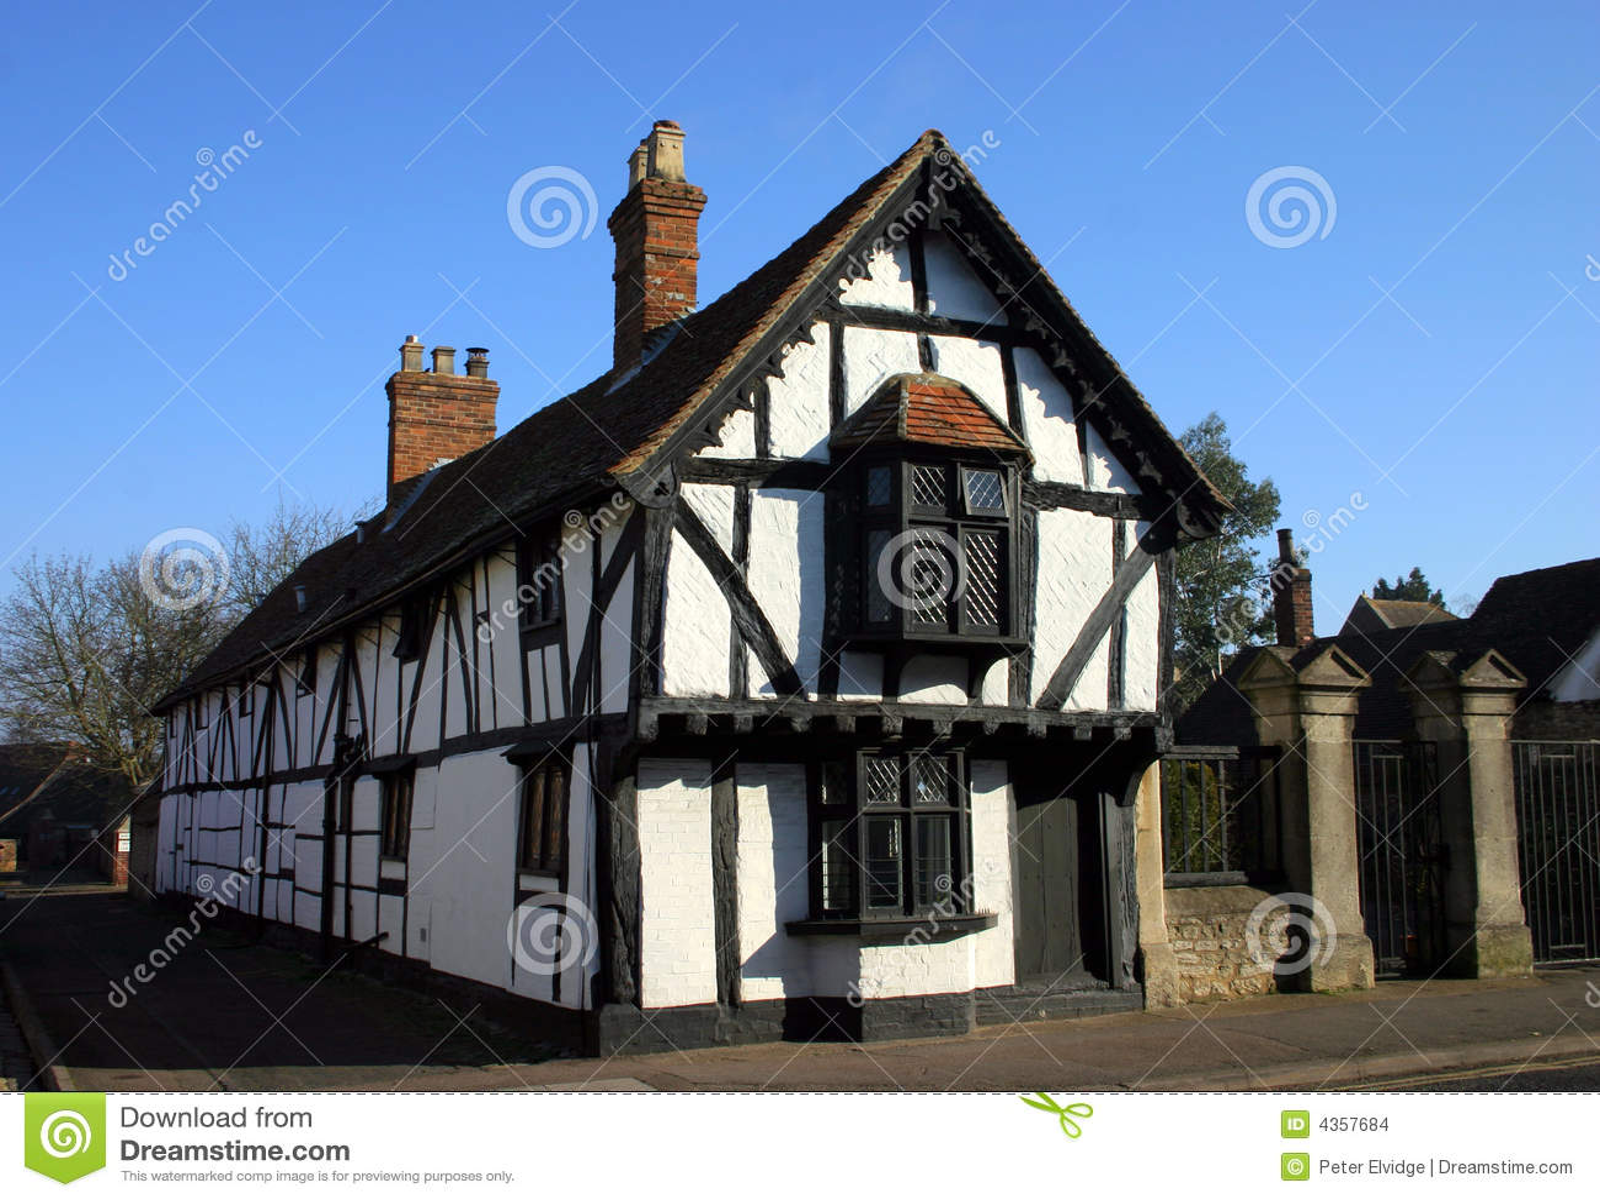 tudor house plans house plans